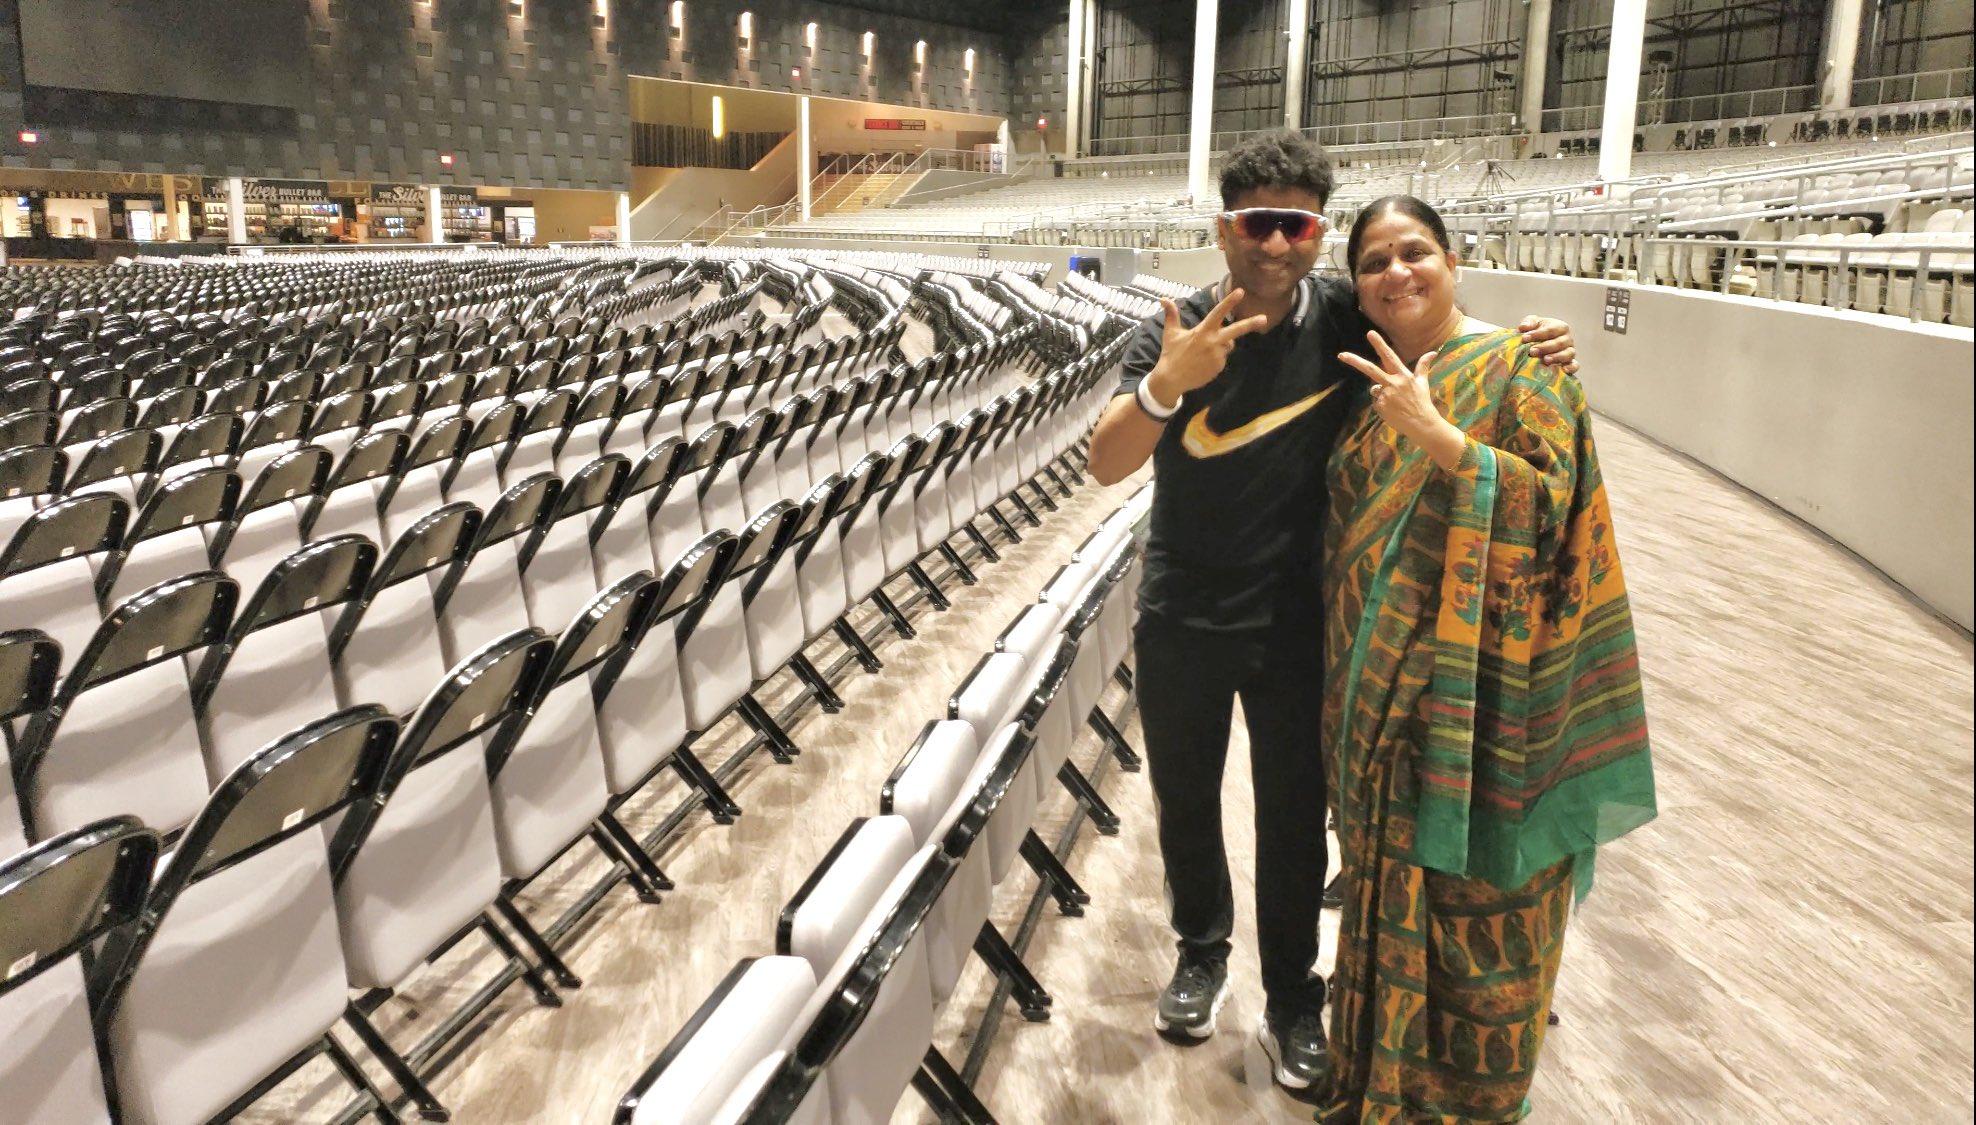 Mothers Day : మదర్స్తో సినీ సెలెబ్స్.. తల్లితో దేవిశ్రీ ప్రసాద్ Photo : Twitter